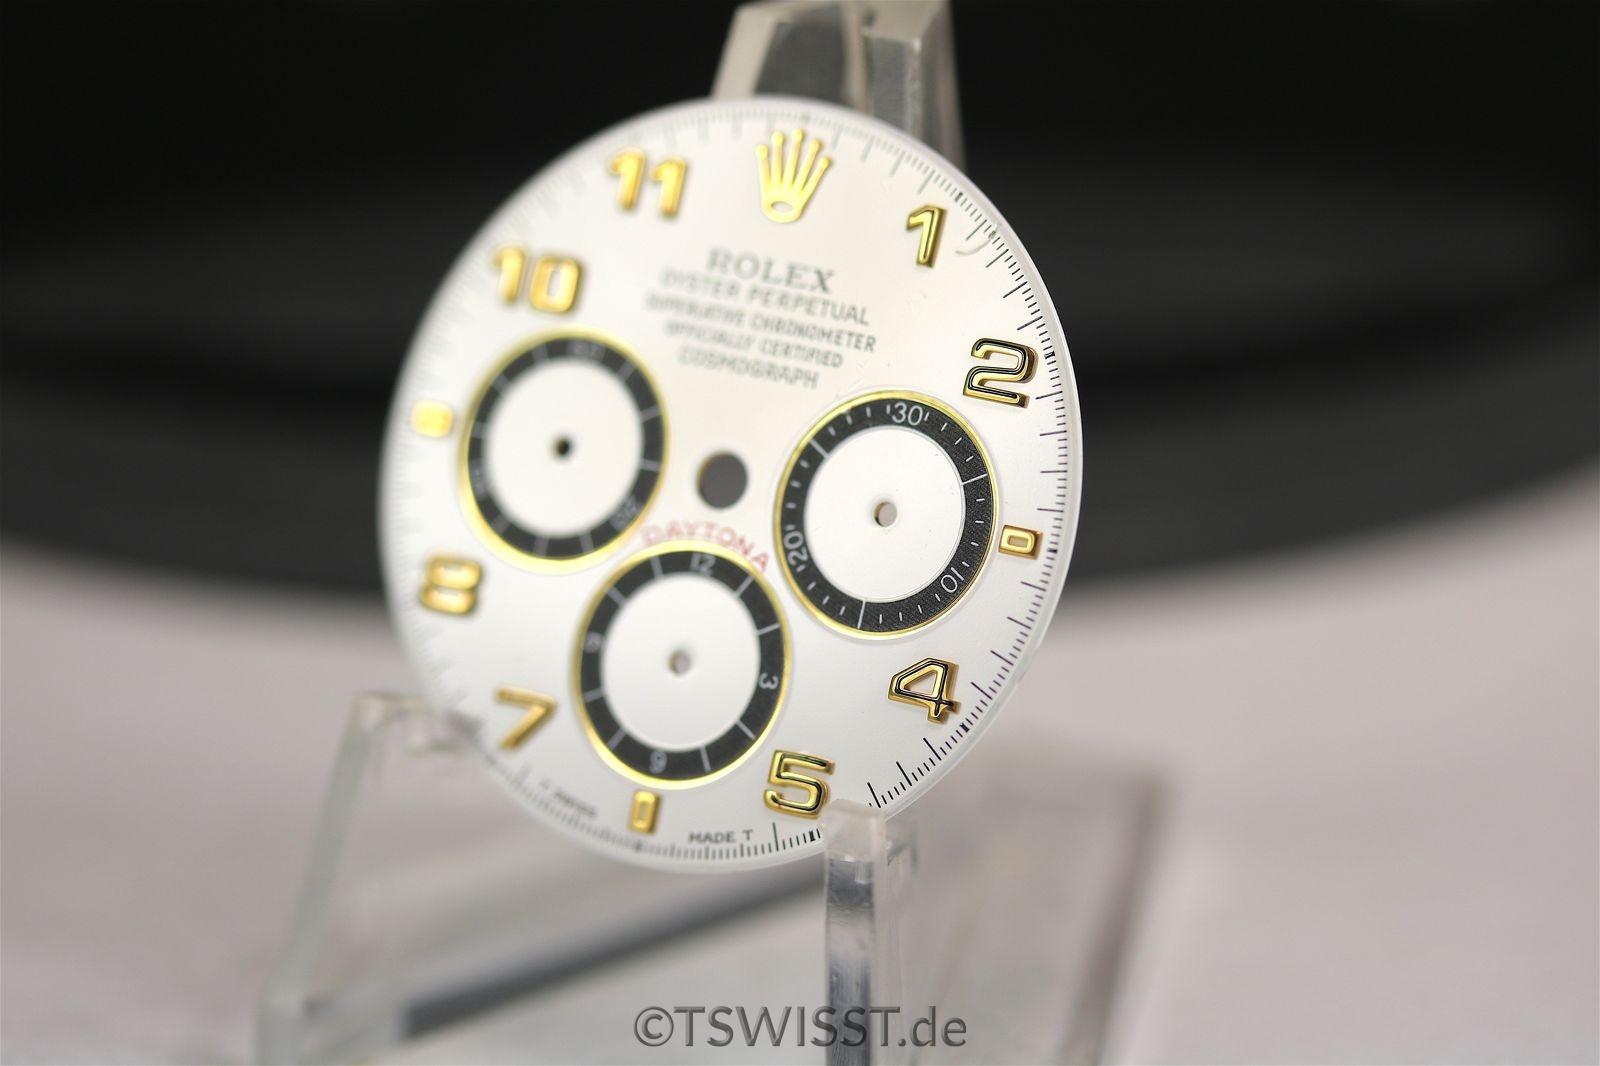 Rolex Daytona dial white arab 16518 16528